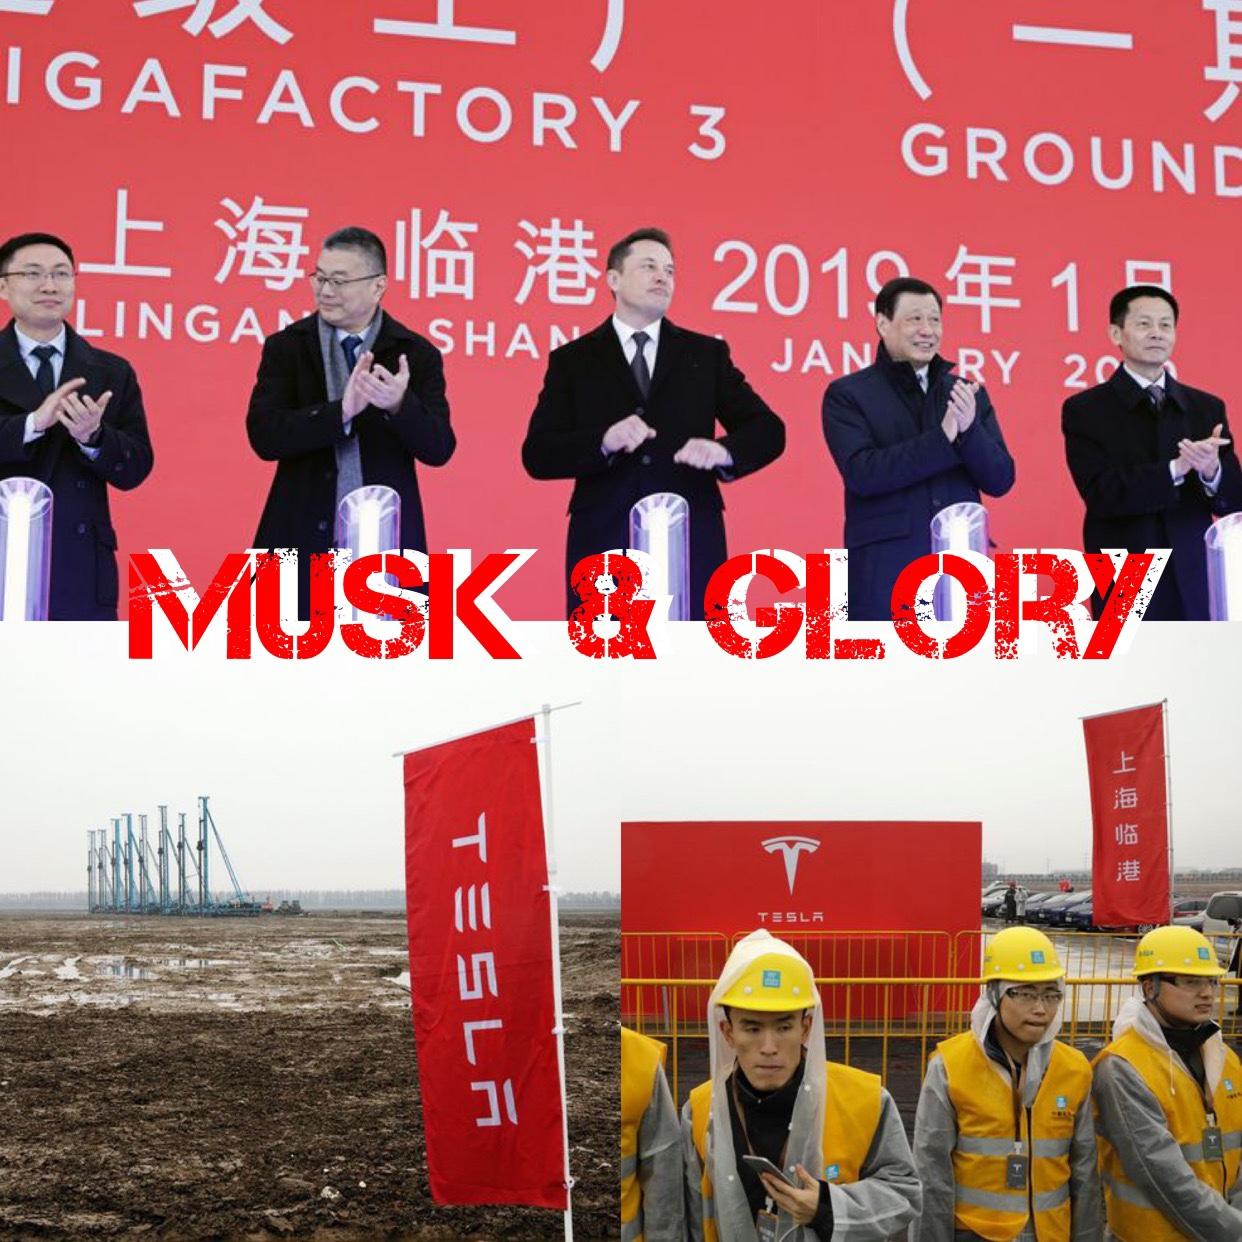 Musk & Glory